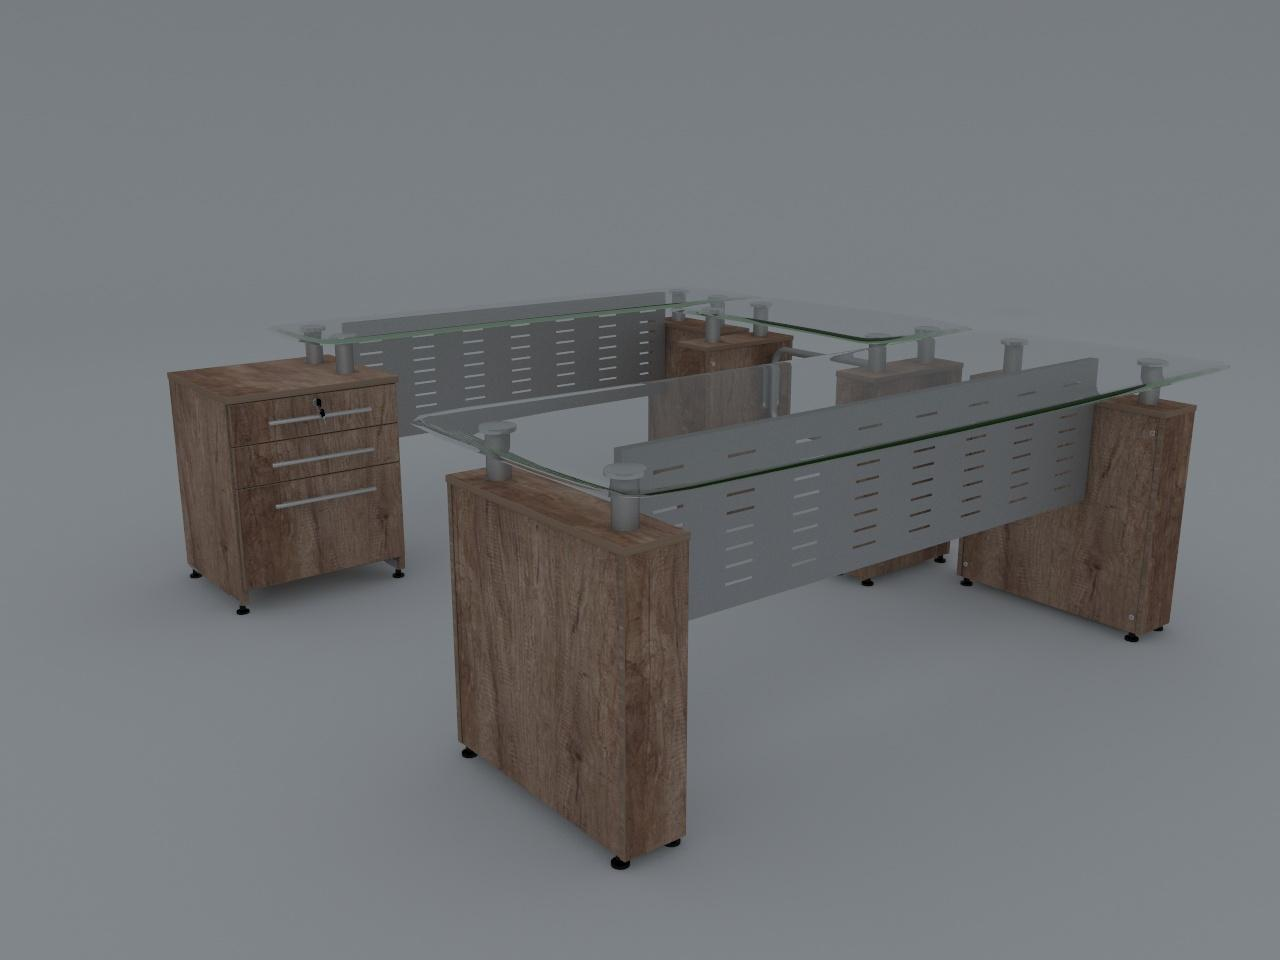 vistas/img/imgProductos/modulo-director-boston-200-x-225-cm-cub-cristal-12mm.jpg